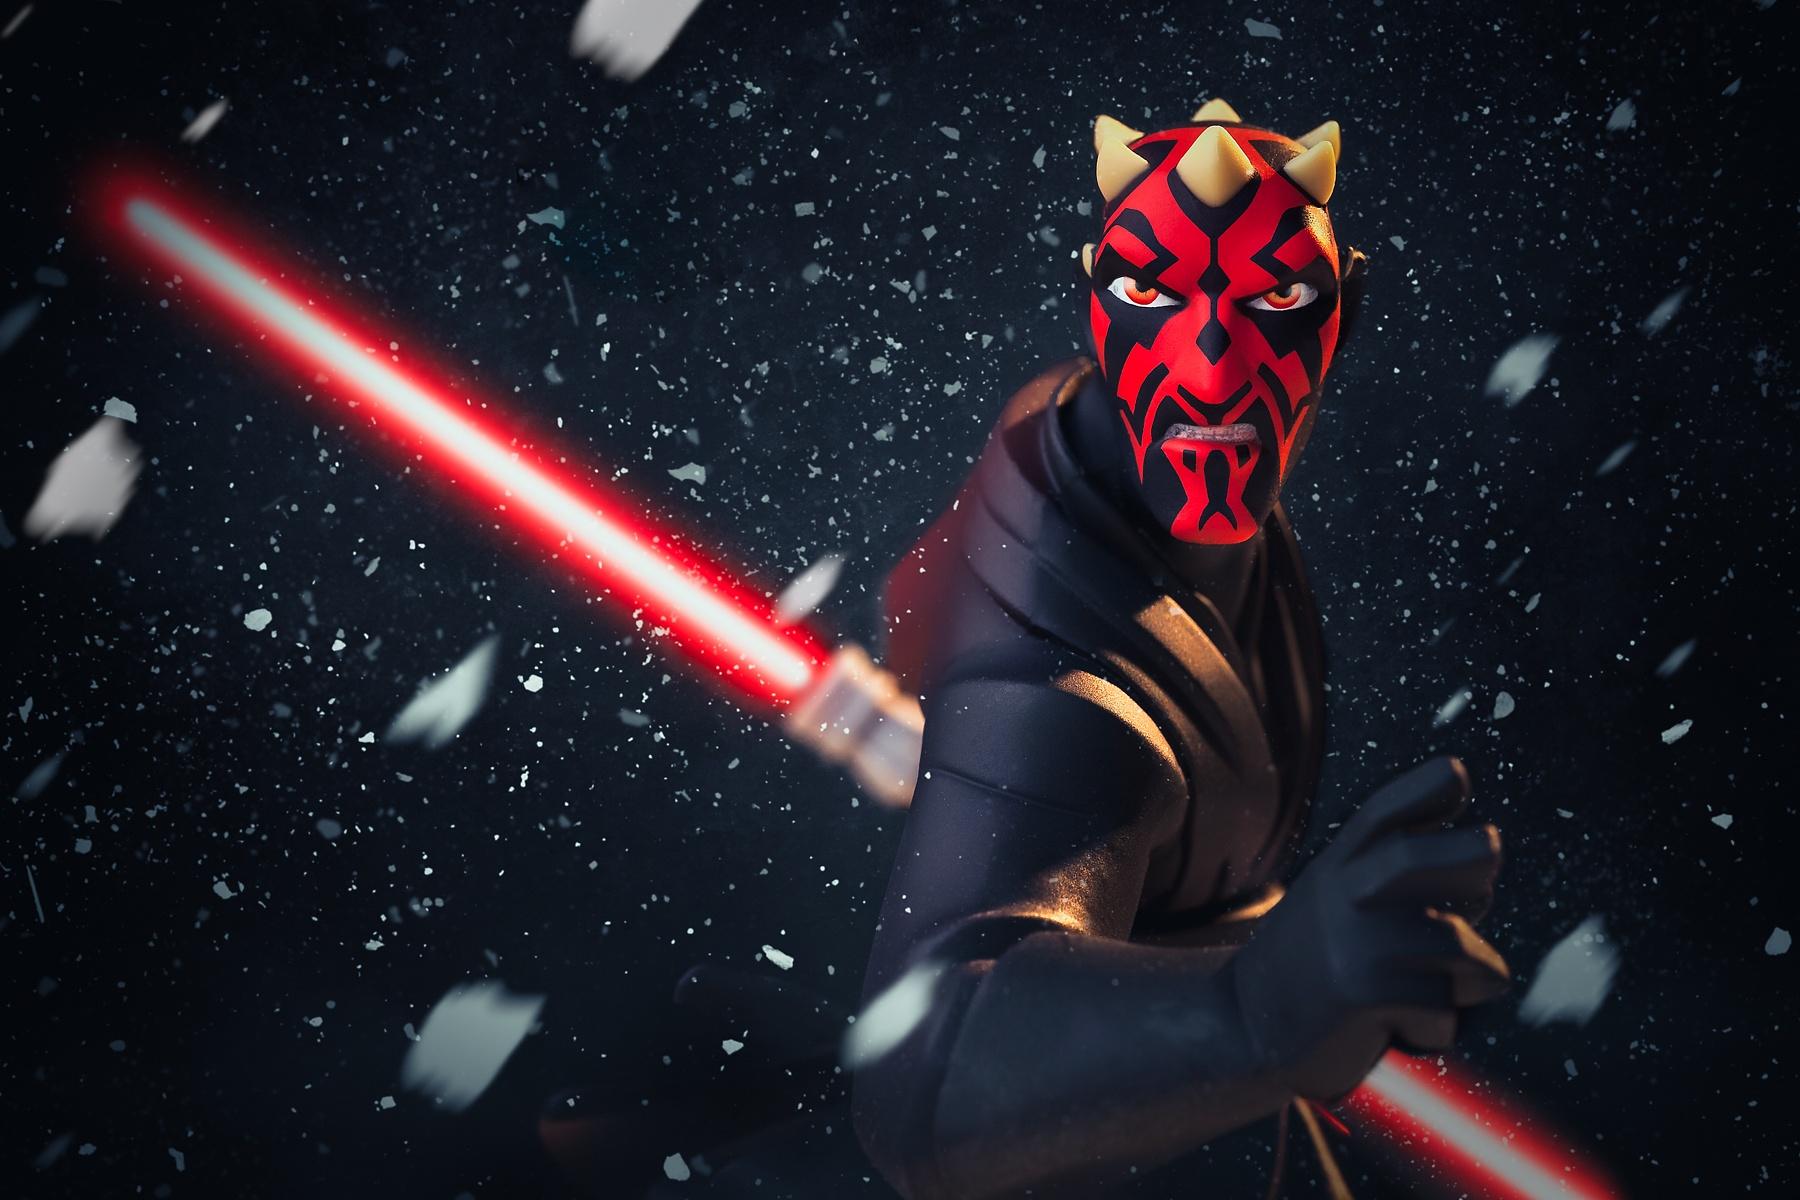 Disney Infinity 3.0's Star Wars Character - DARTH MAUL by Dade Freeman